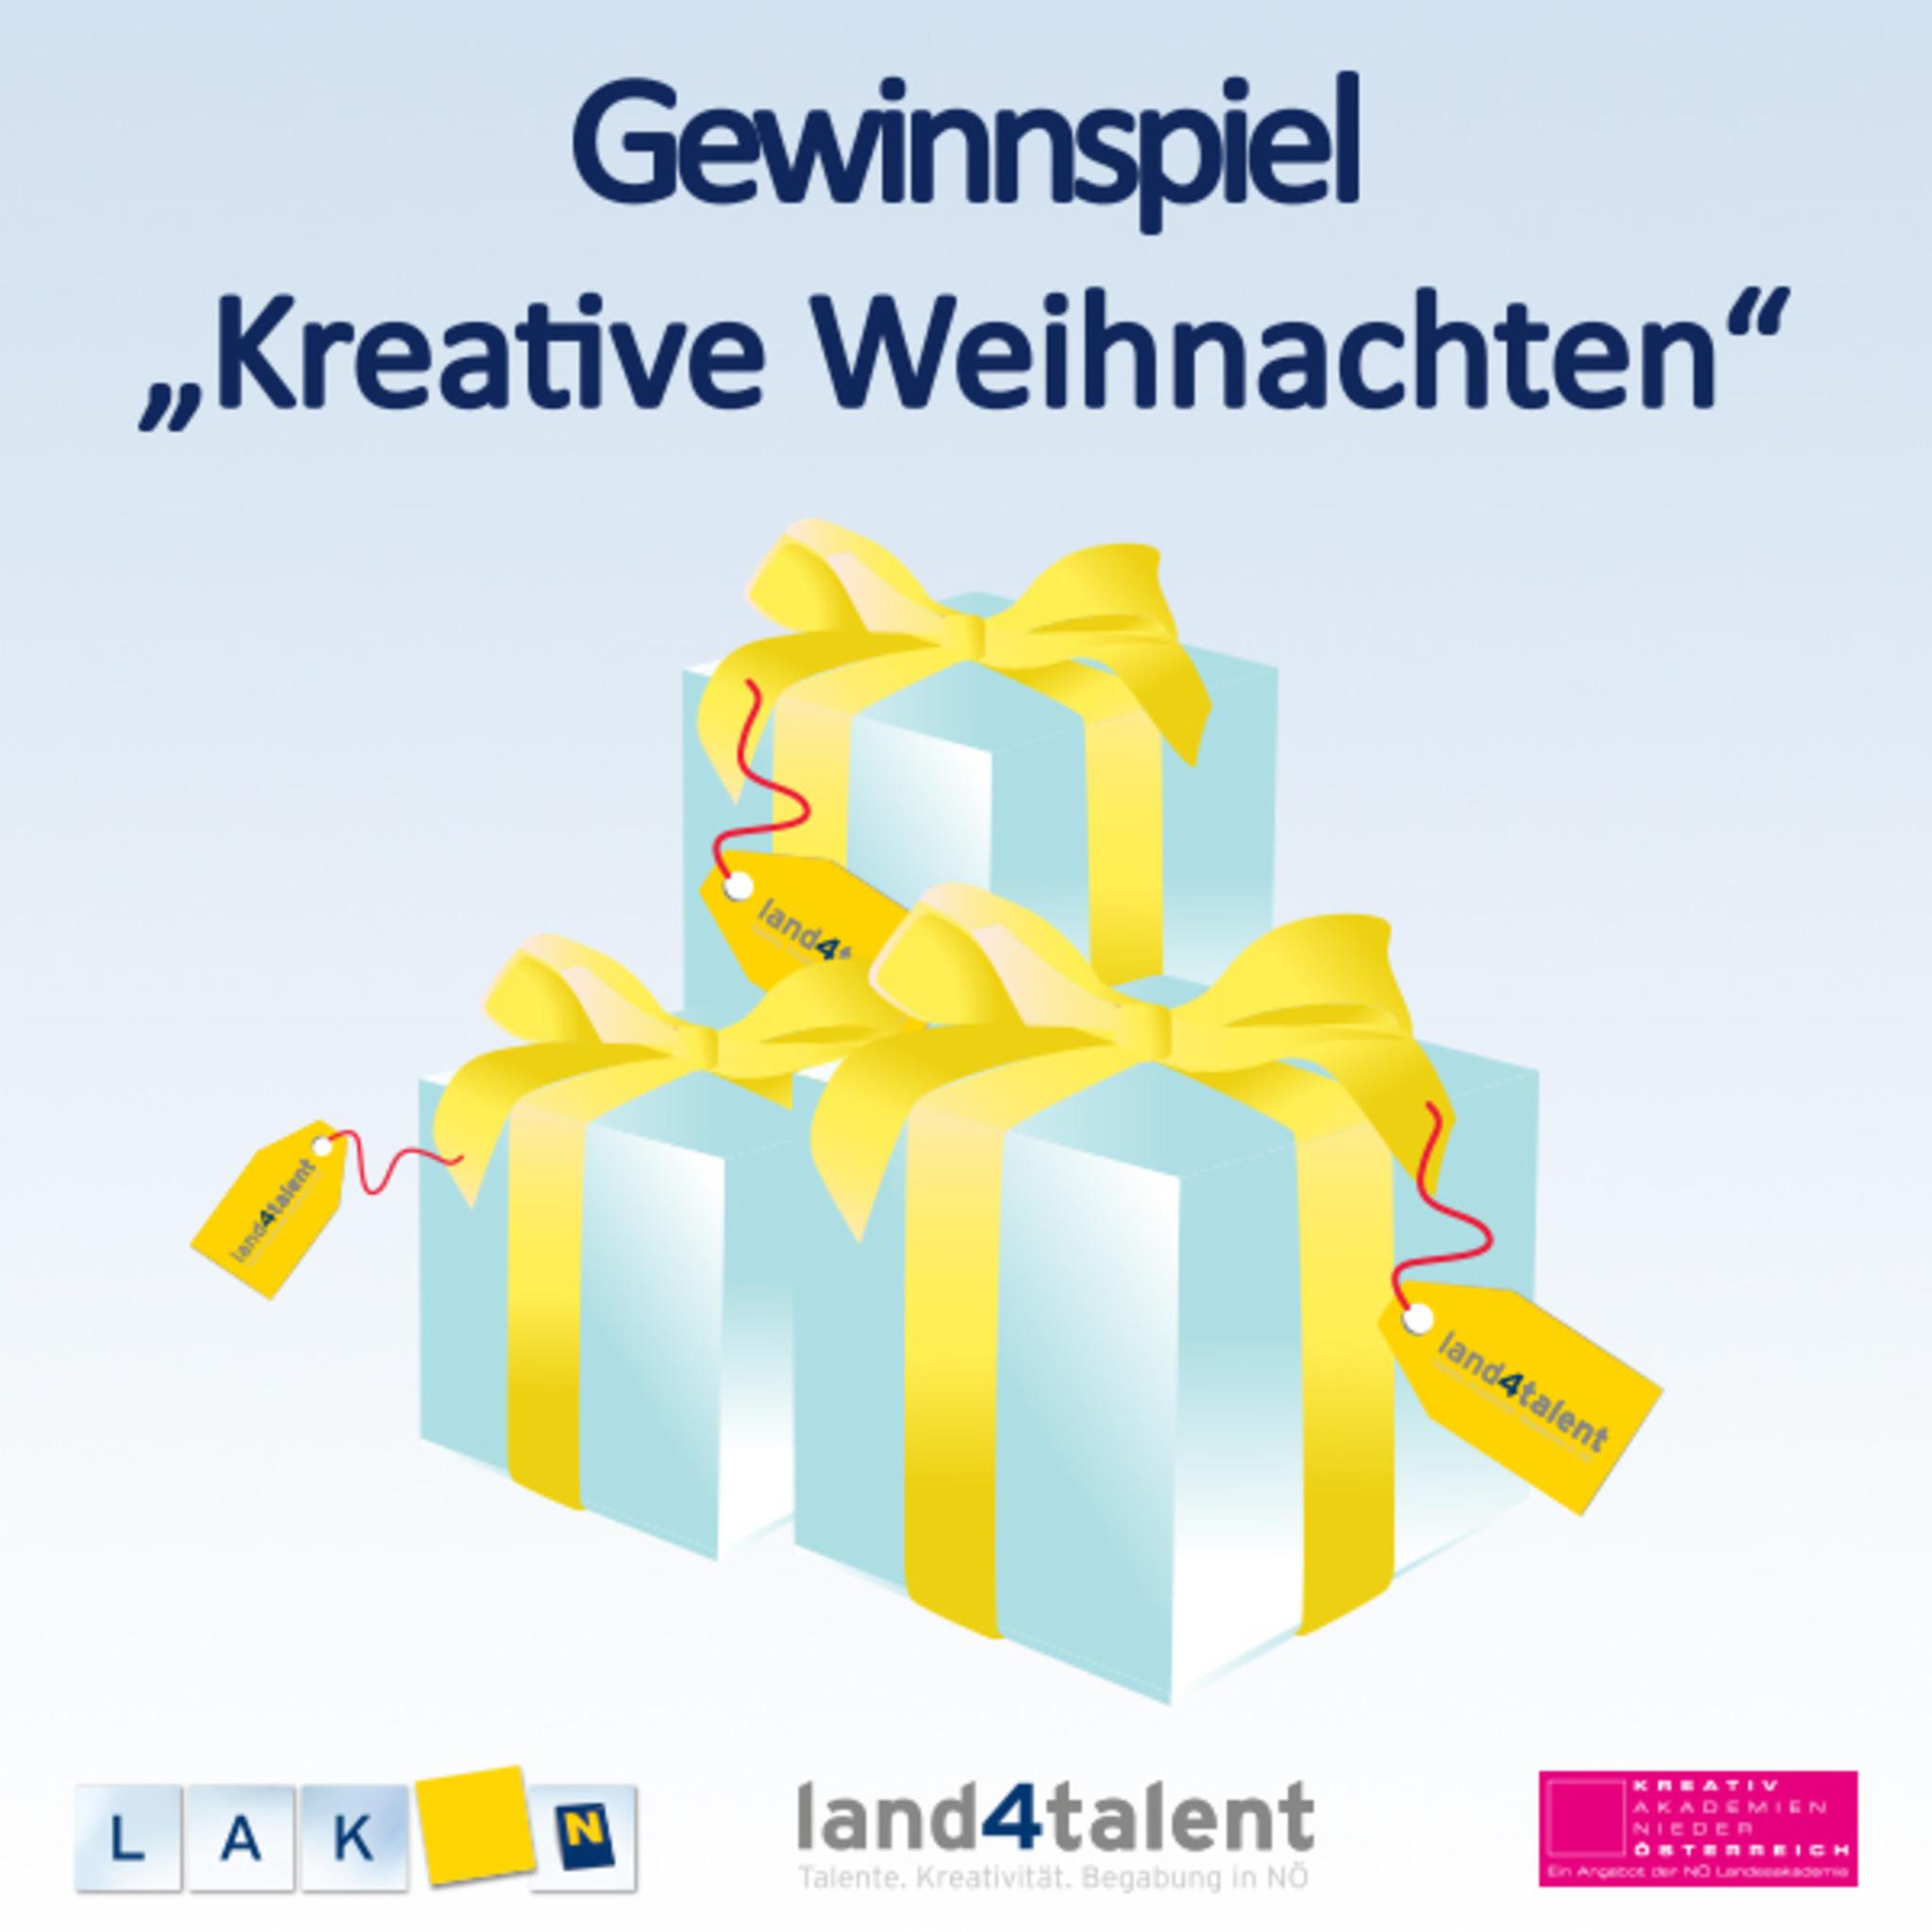 Kreative Gewinnspiele Facebook